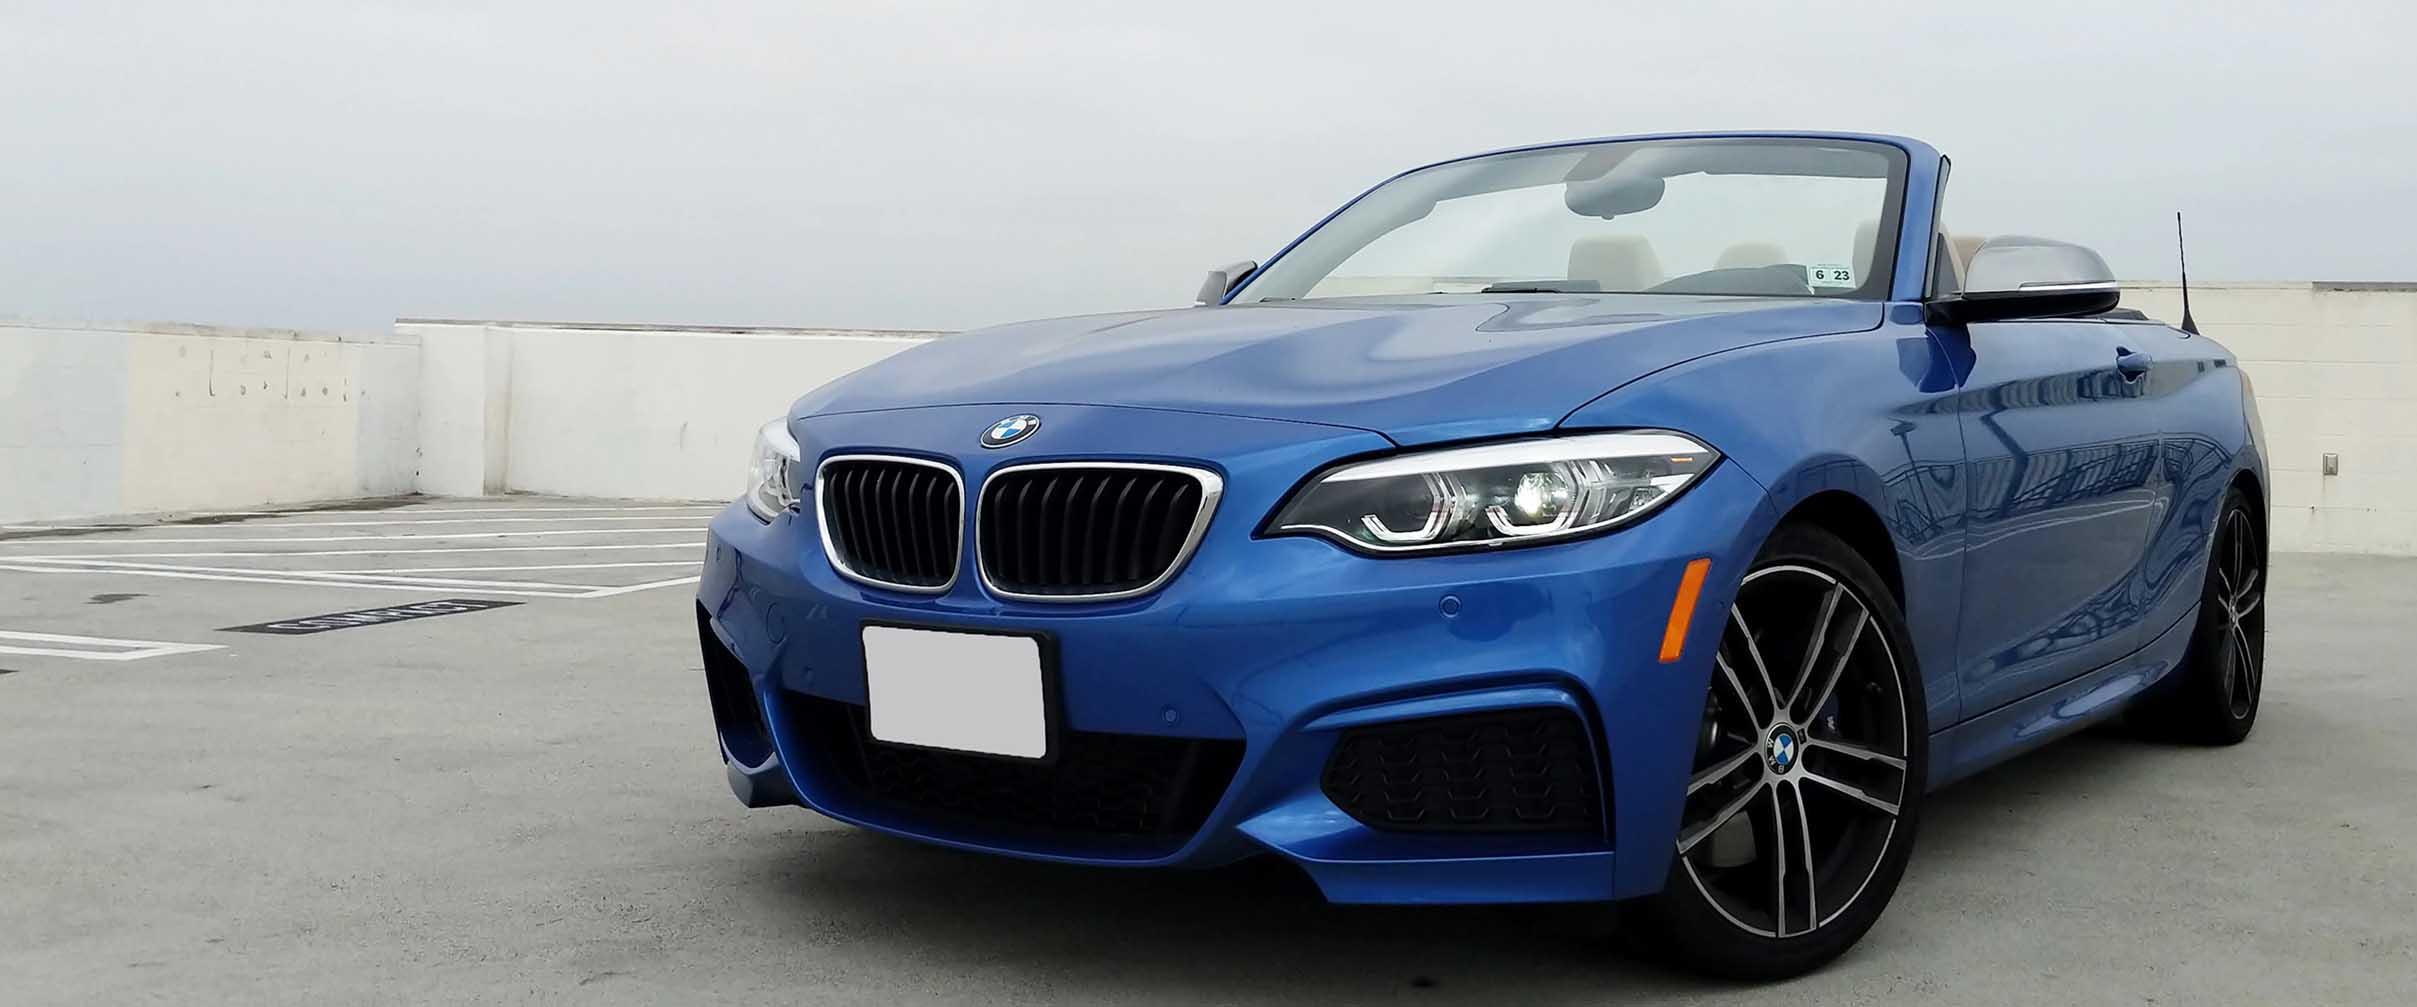 BMW San Diego Service Appointment